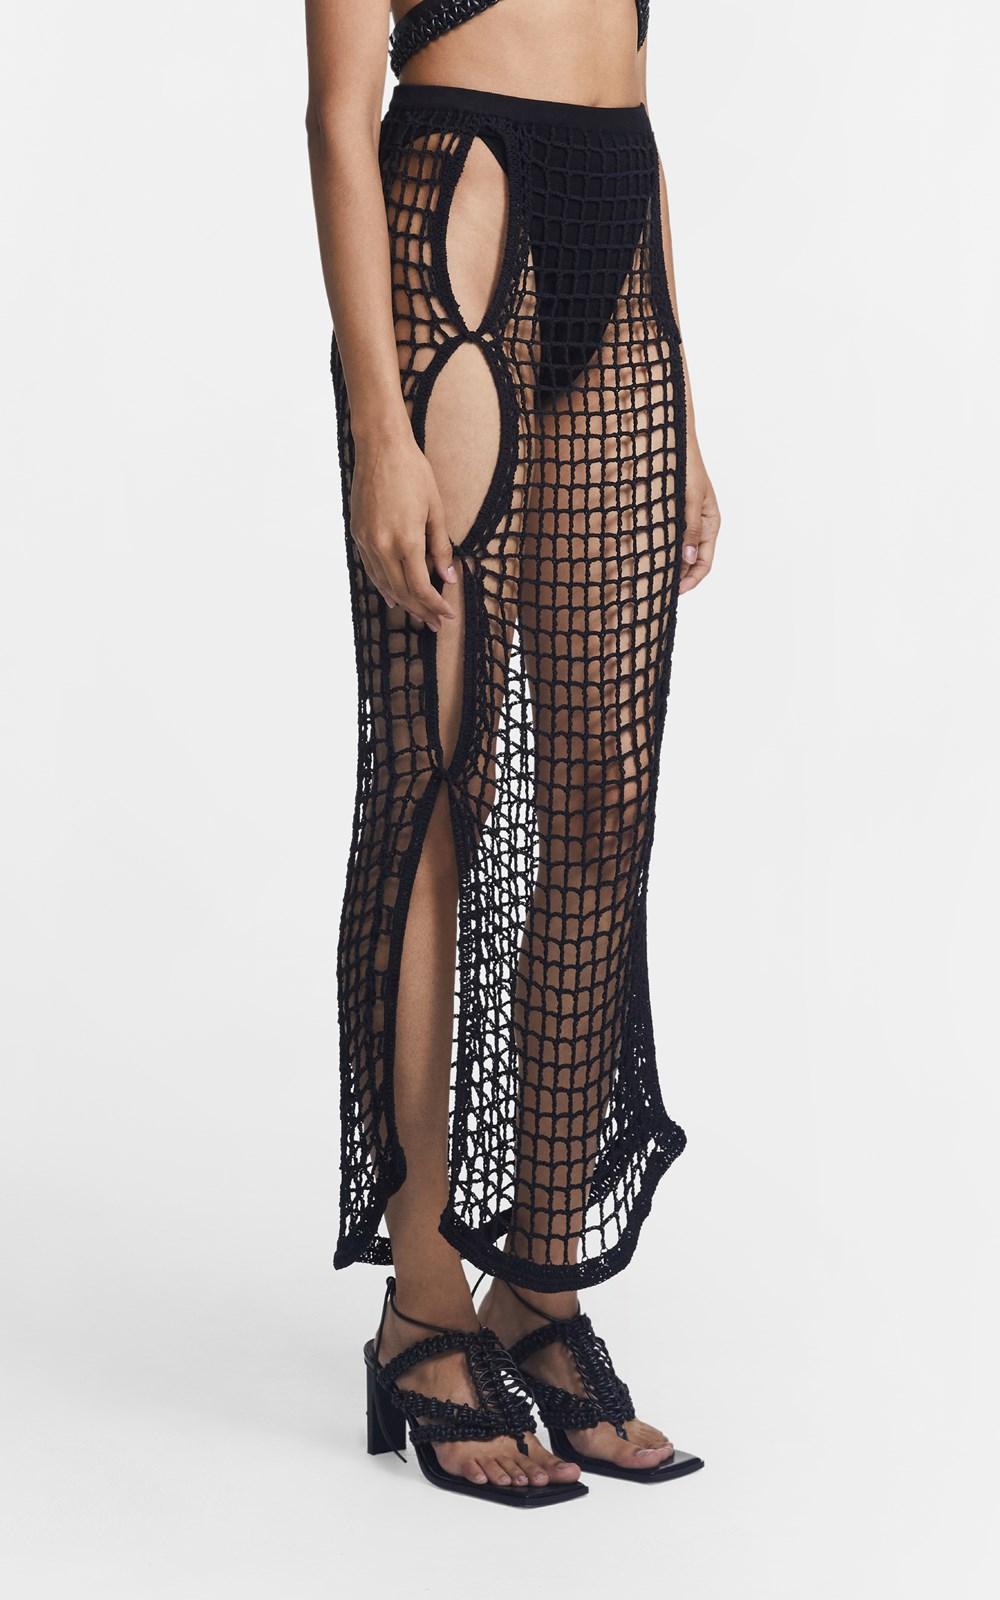 Knitwear | CHAIN CROCHET SKIRT